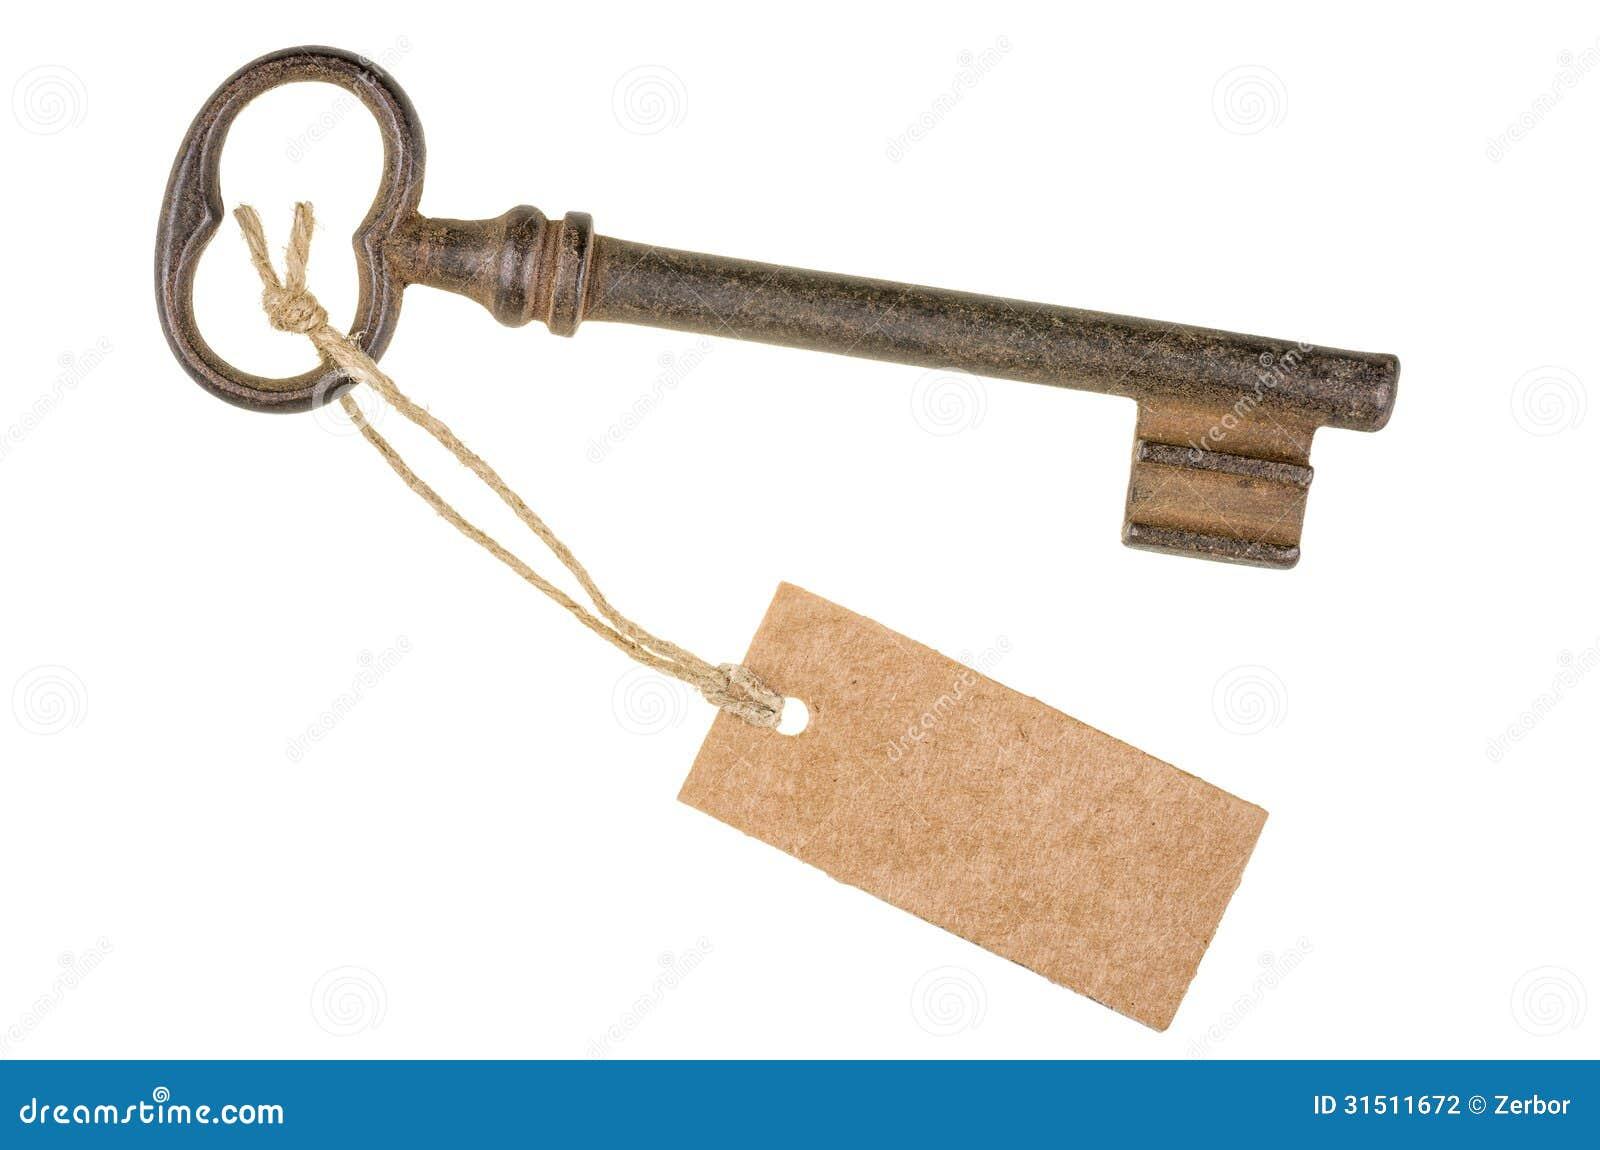 how to use openweathermap api key